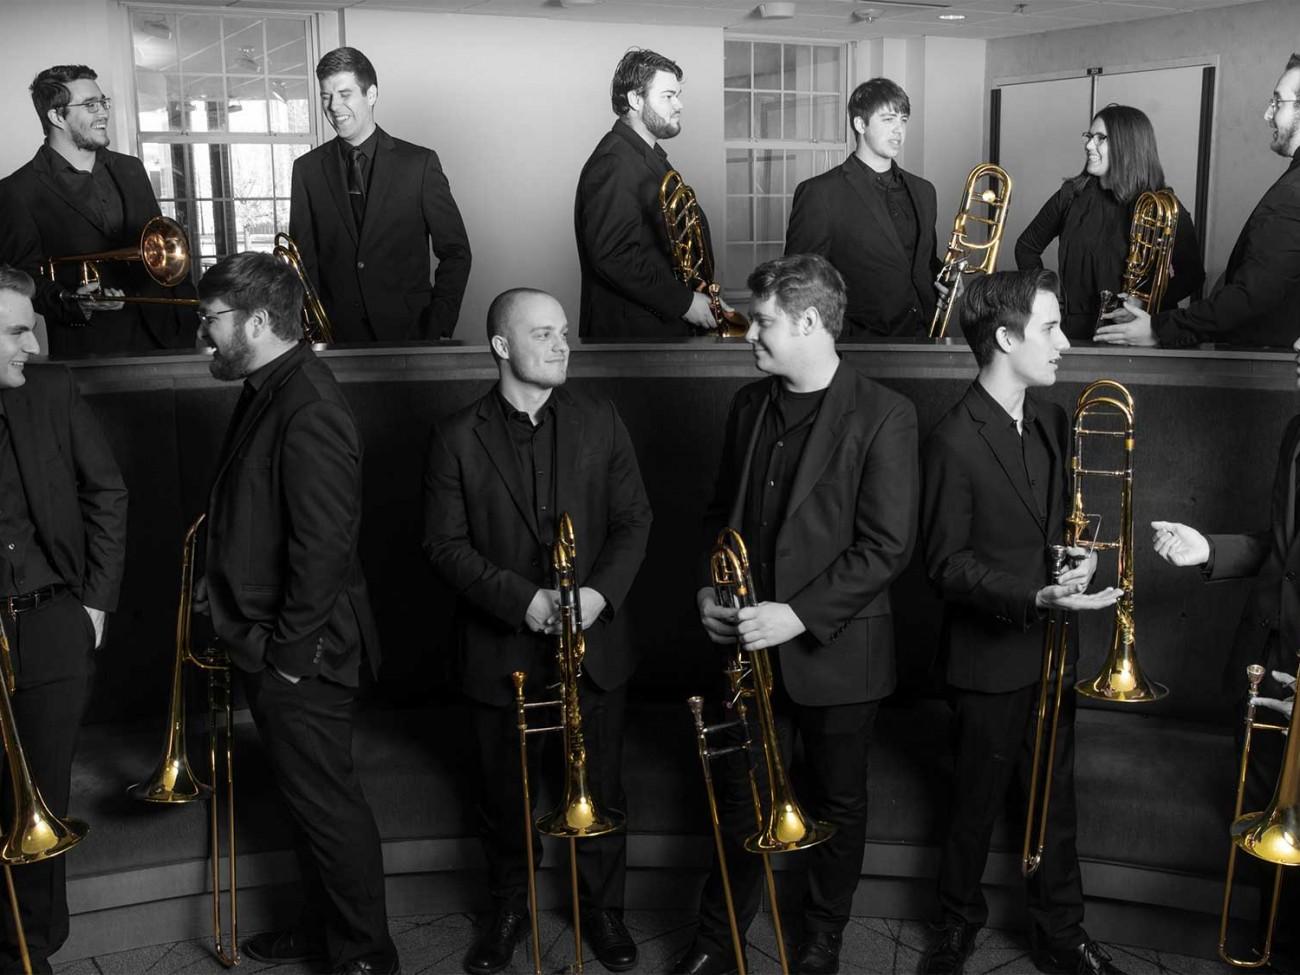 OSU Trombones at the 2019 American Trombone Workshop